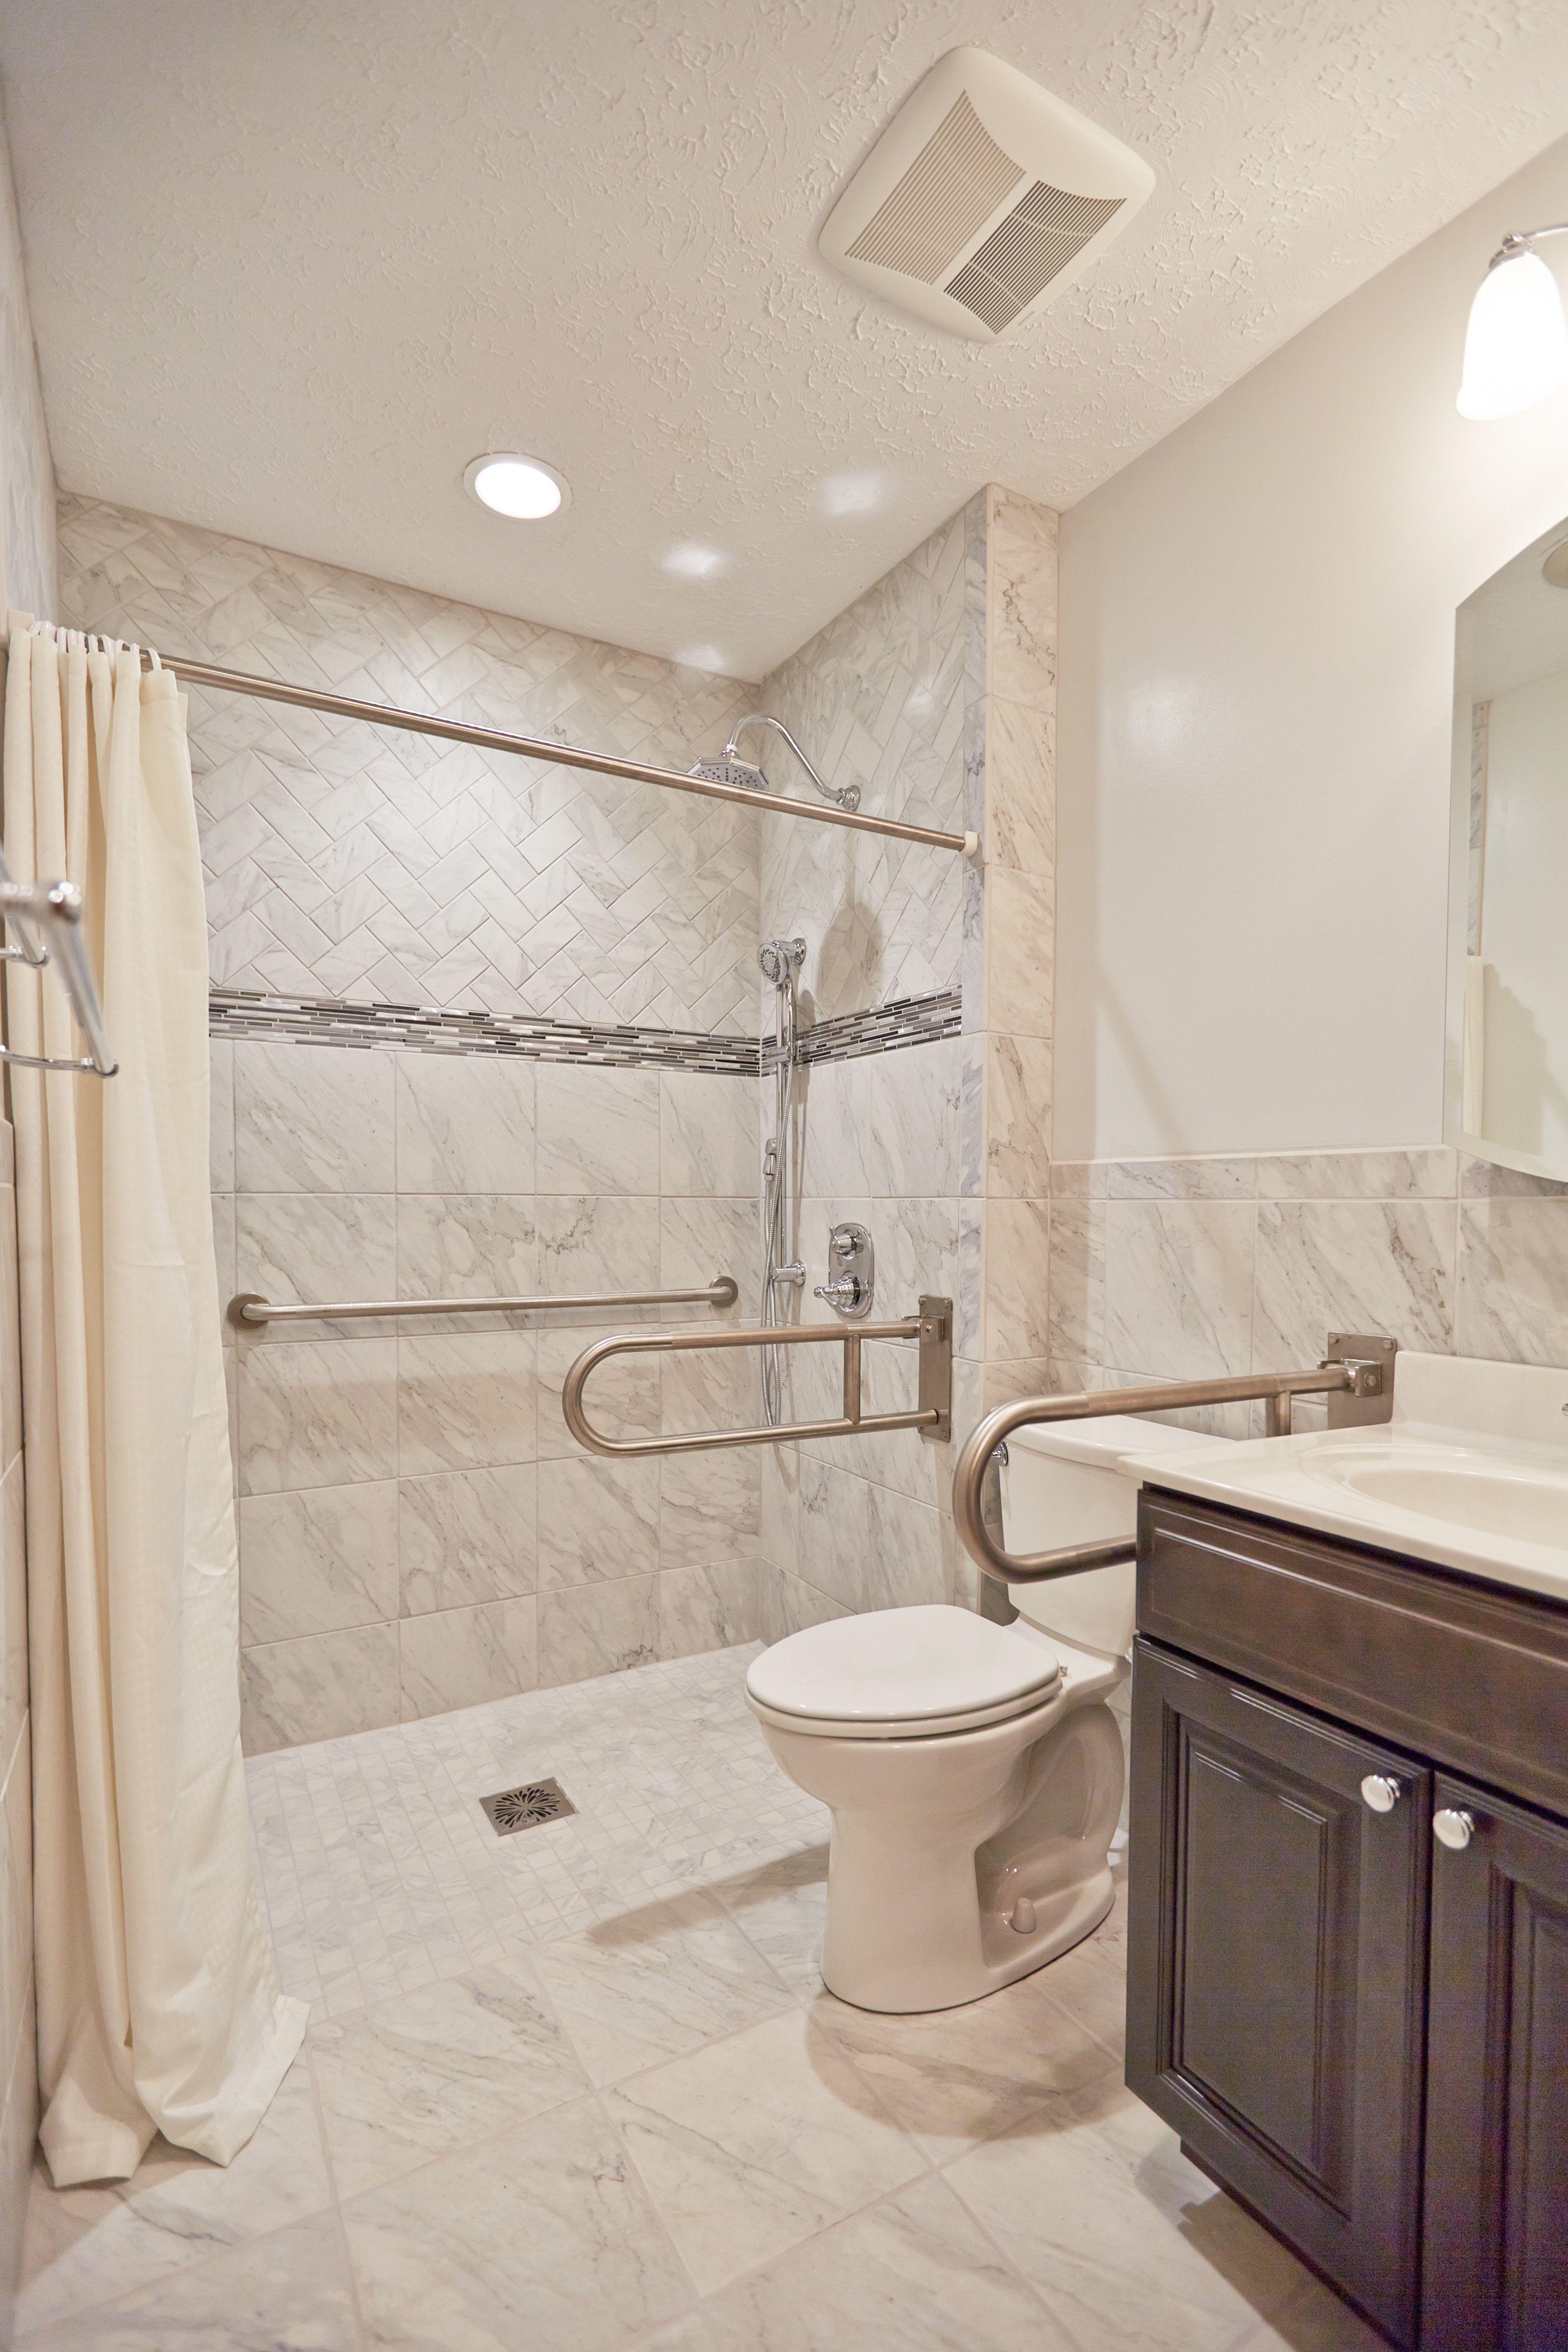 19 Universal Design Boosts Bathroom Accessibility Ceplukan Accessible Bathroom Design Handicap Bathroom Design Handicap Bathroom